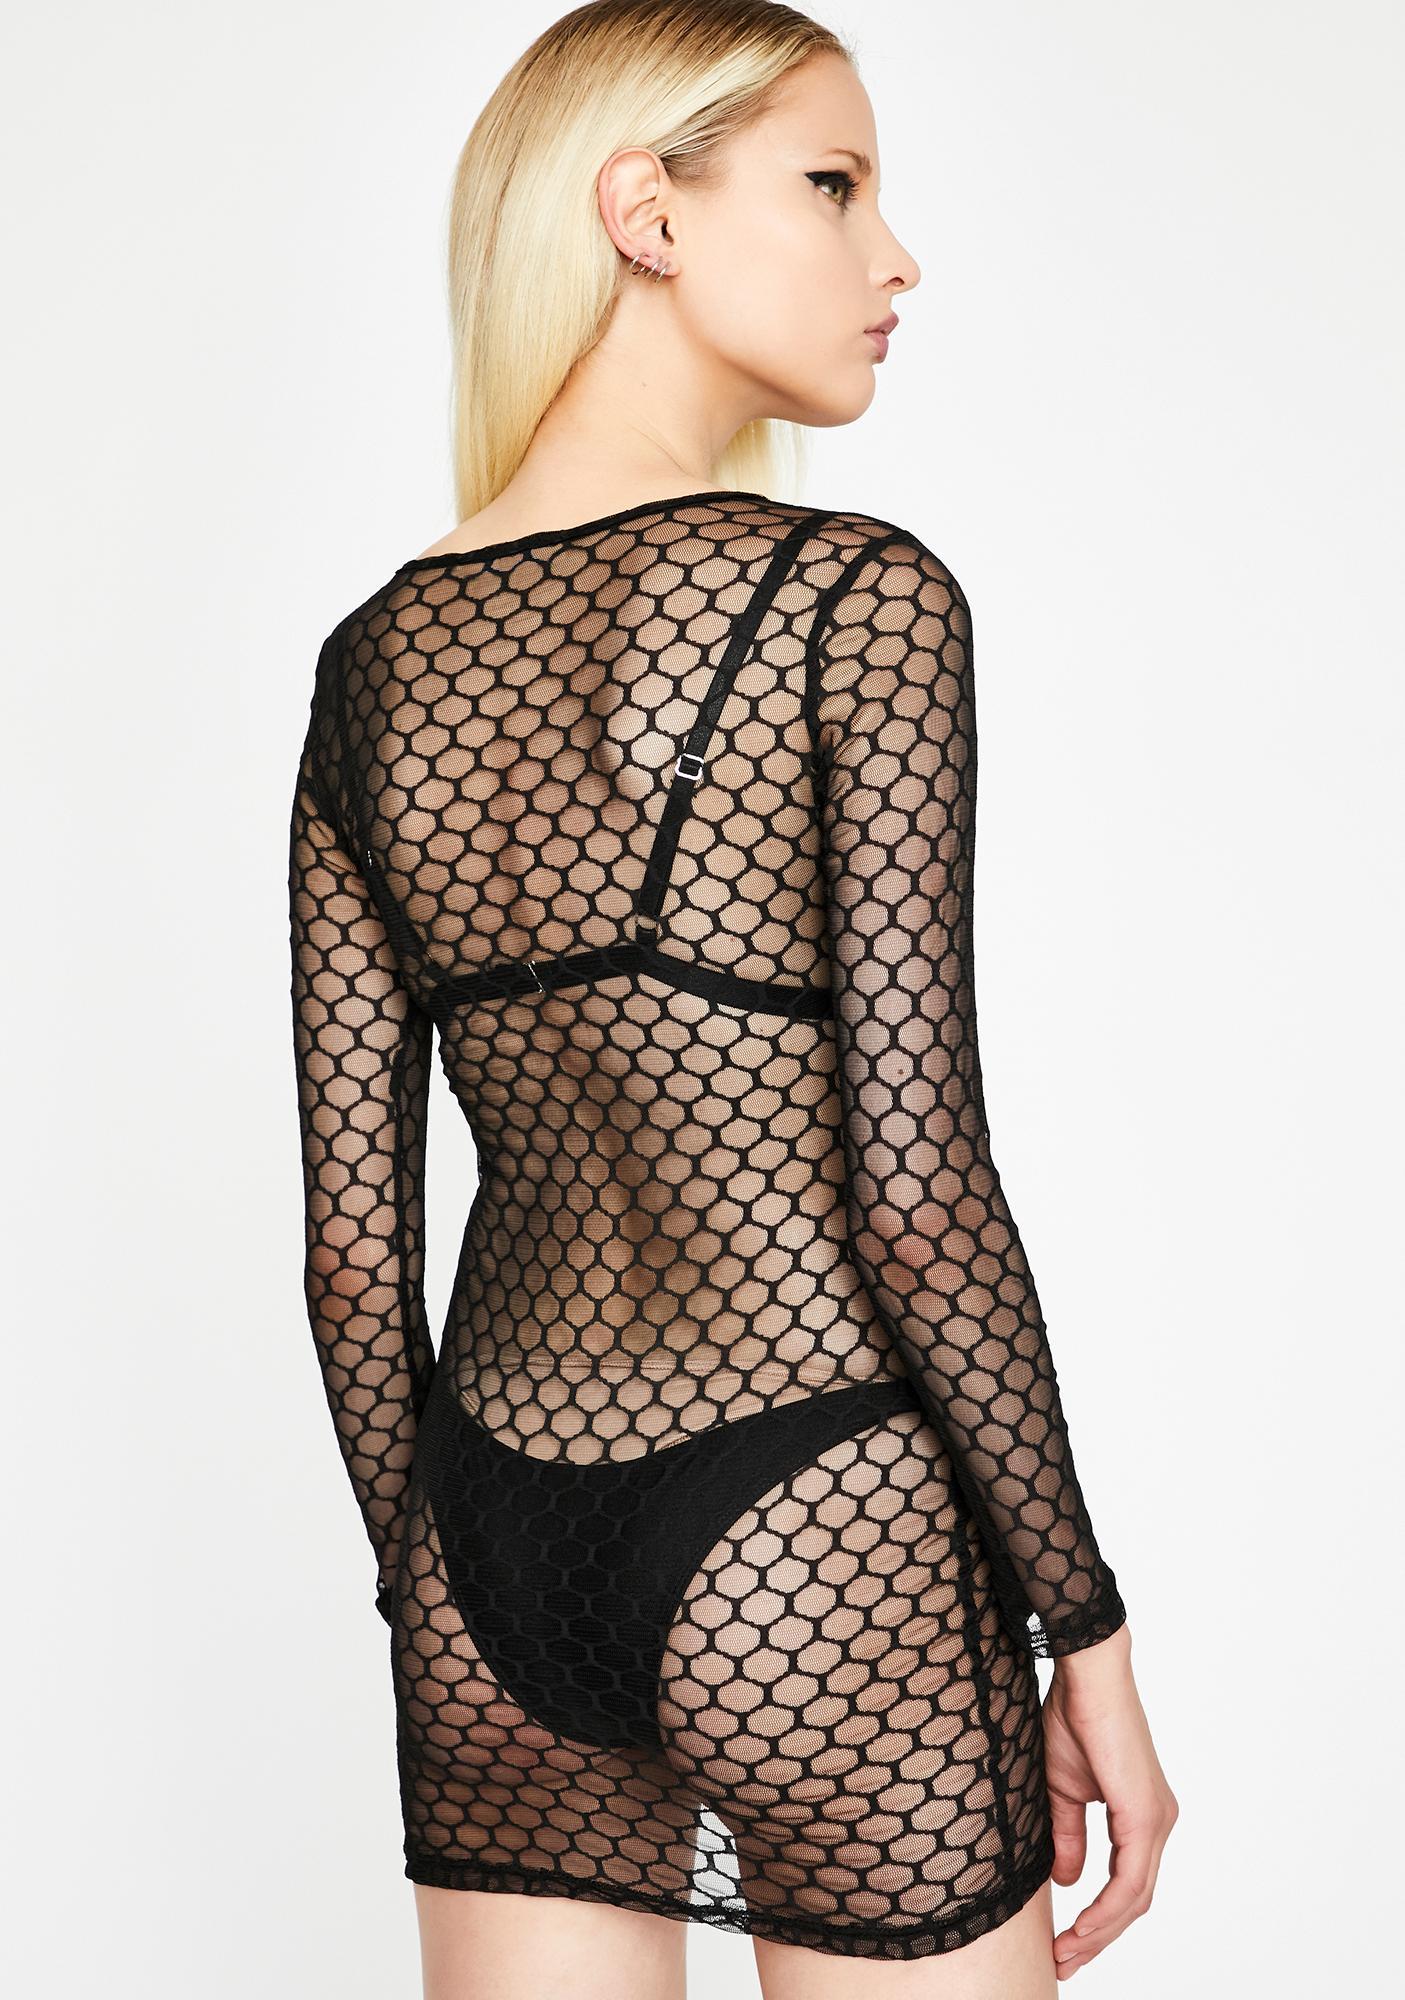 Nightlife Honey Sheer Dress